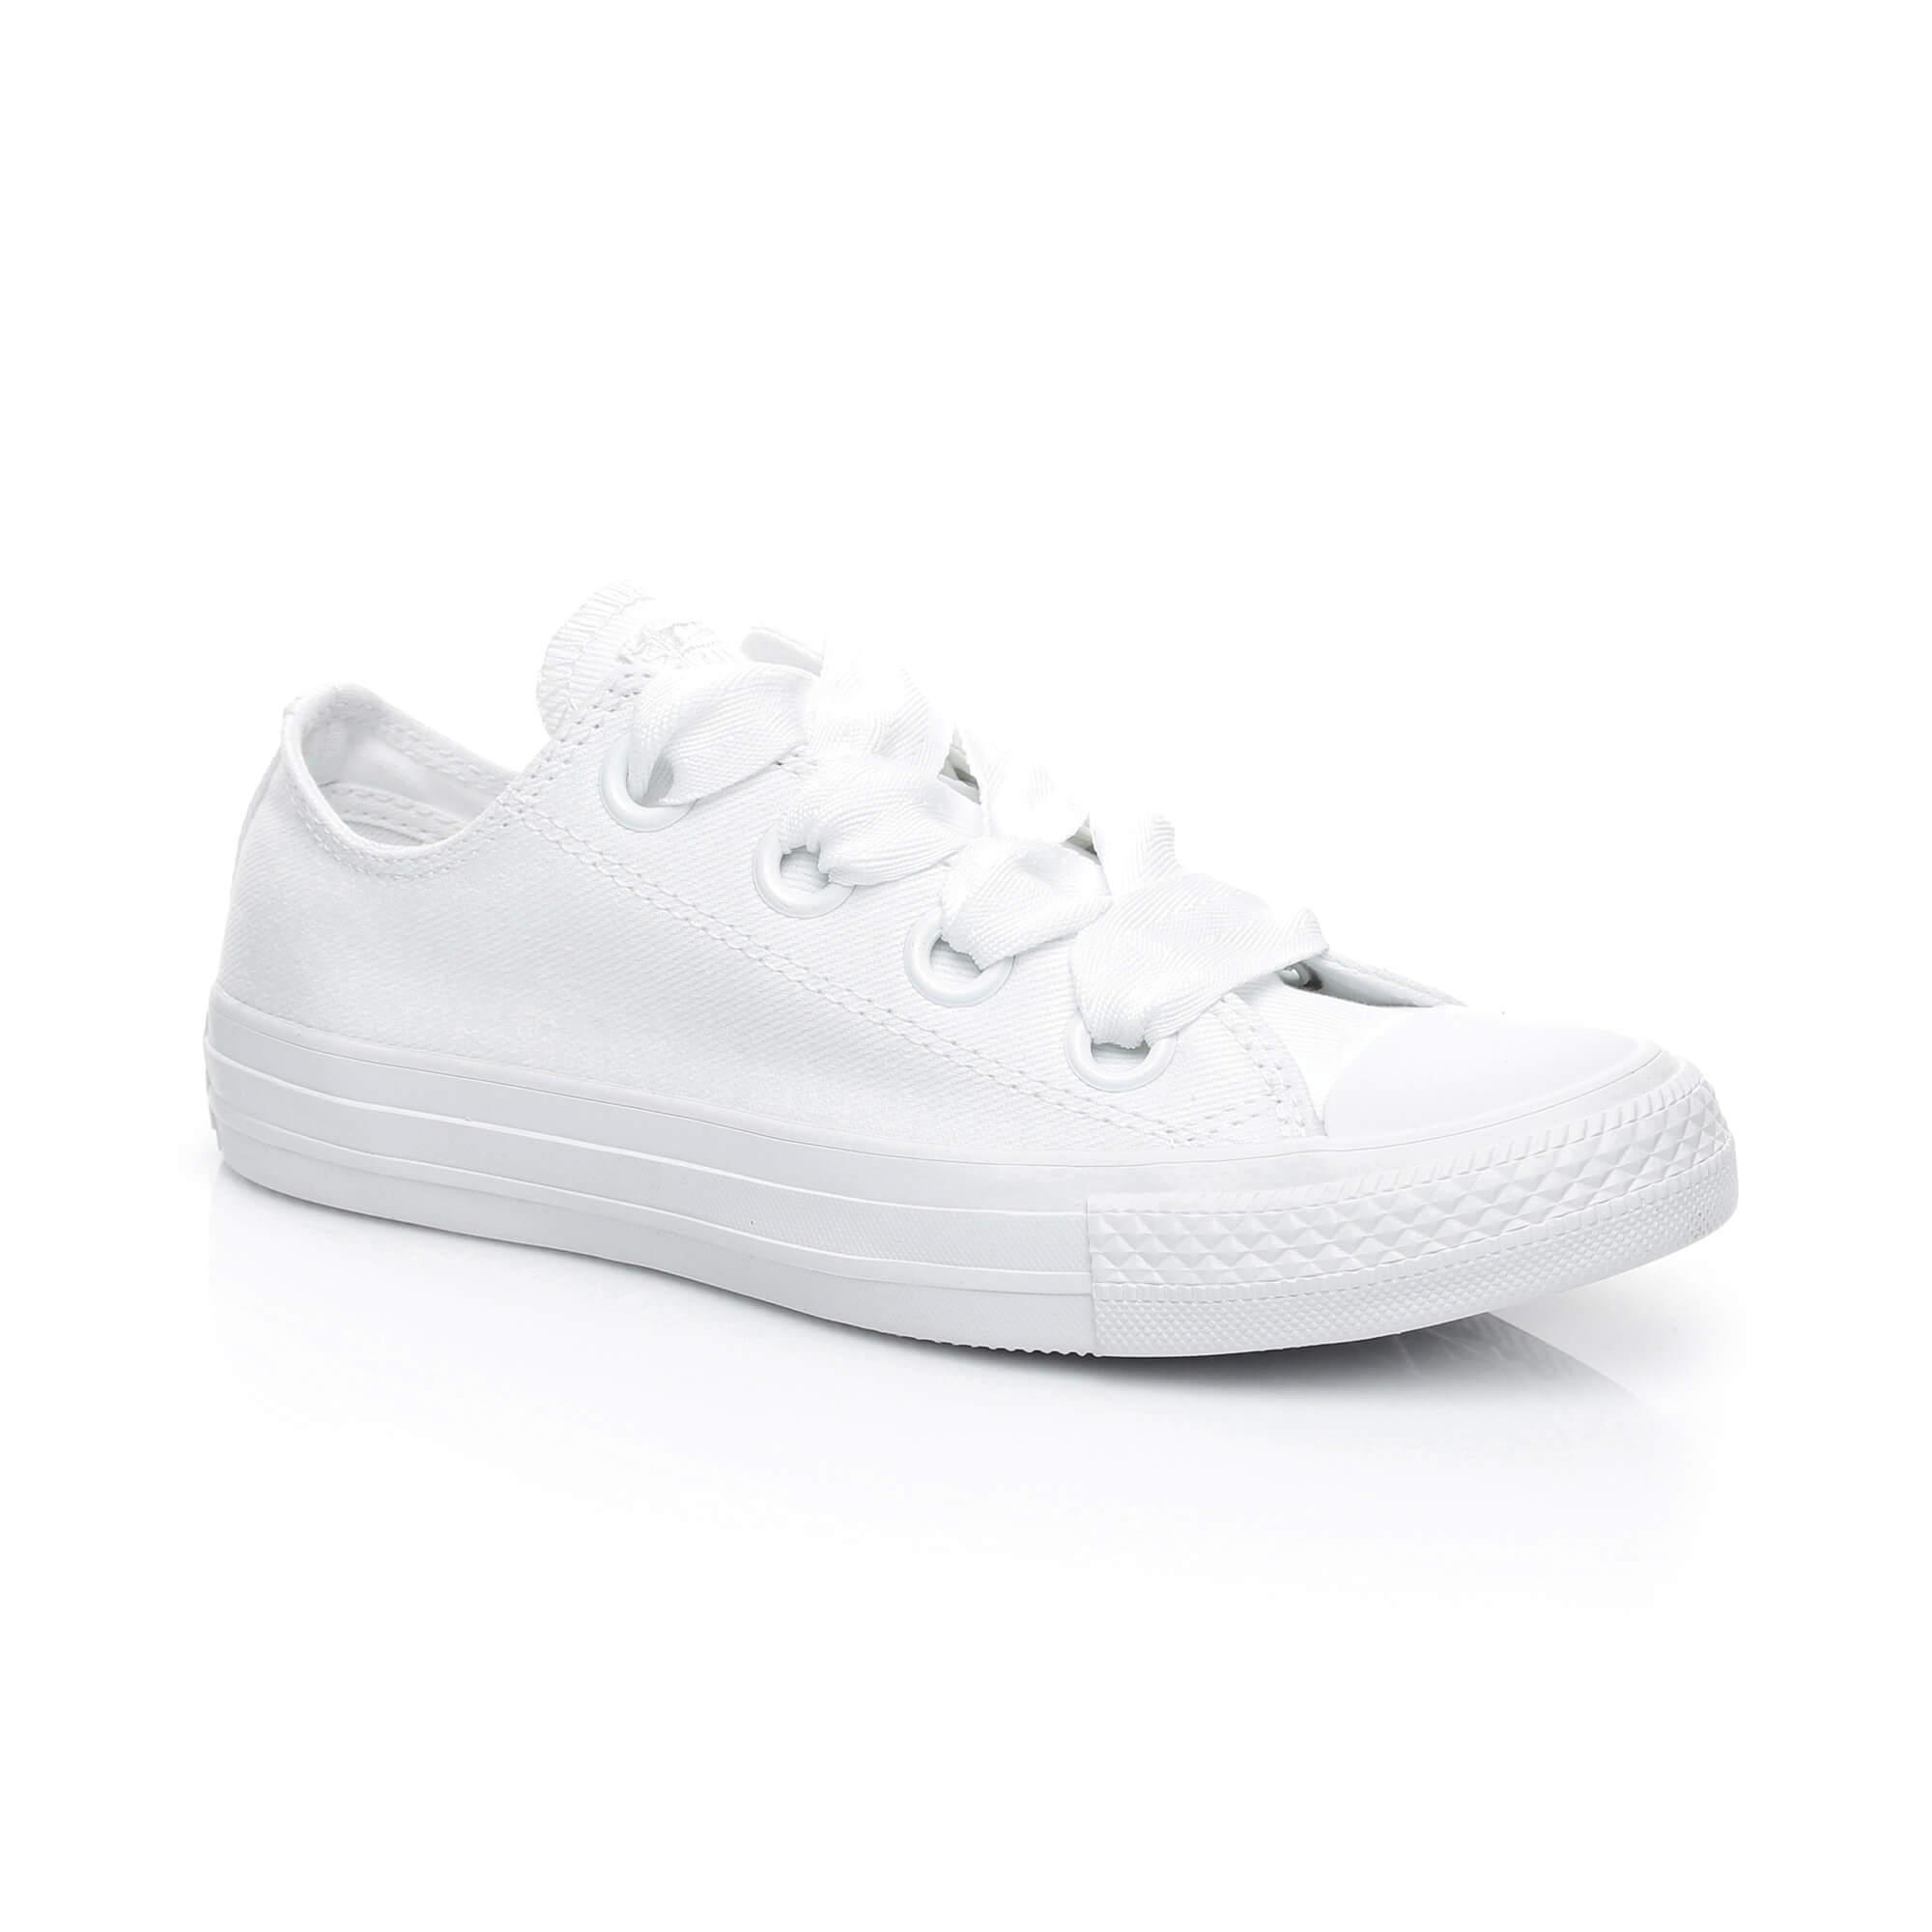 Converse Chuck Taylor Big Eyelets Kadın Beyaz Sneaker